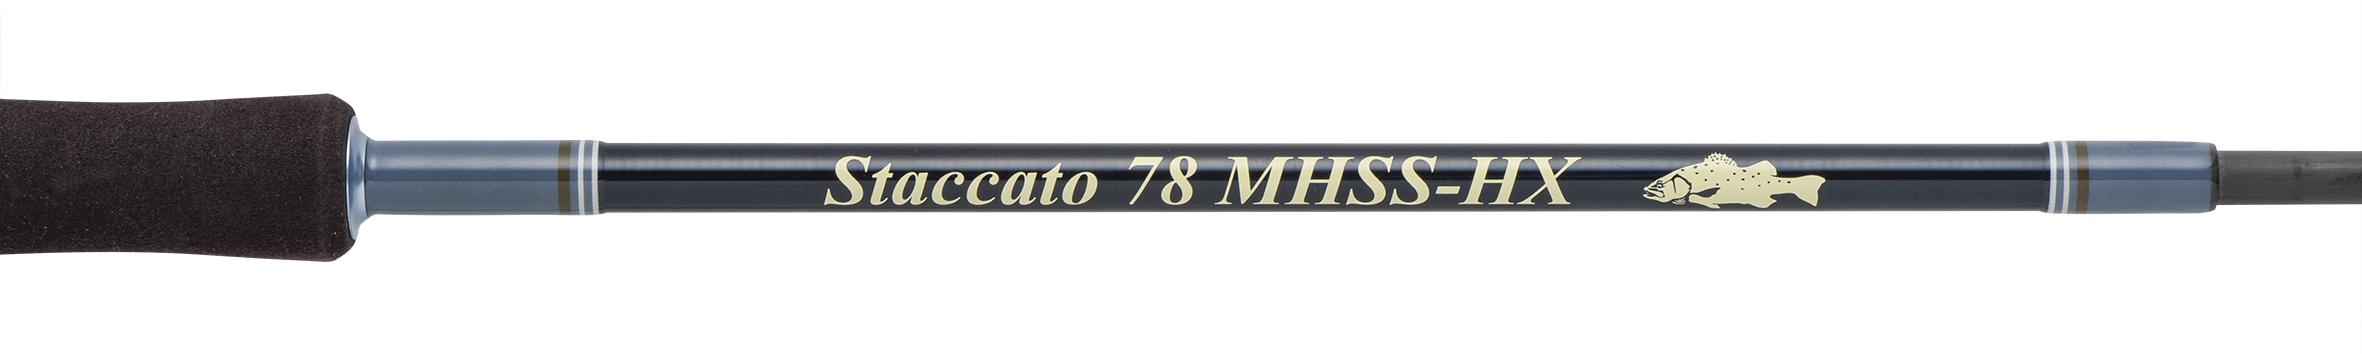 Staccato78MHSS-HX | ロゴ